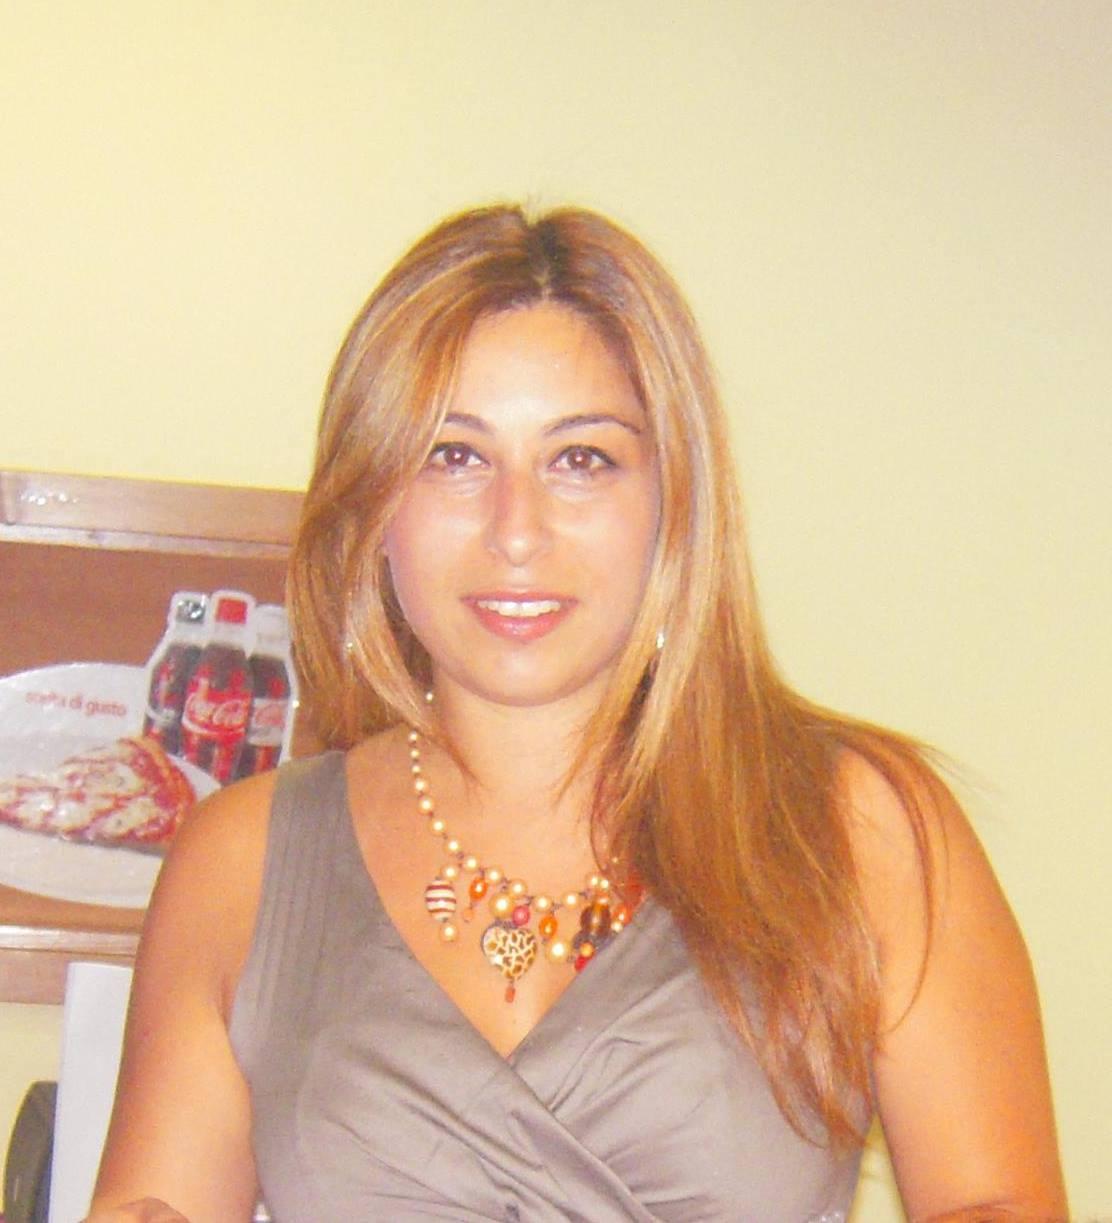 Nadia Nardi